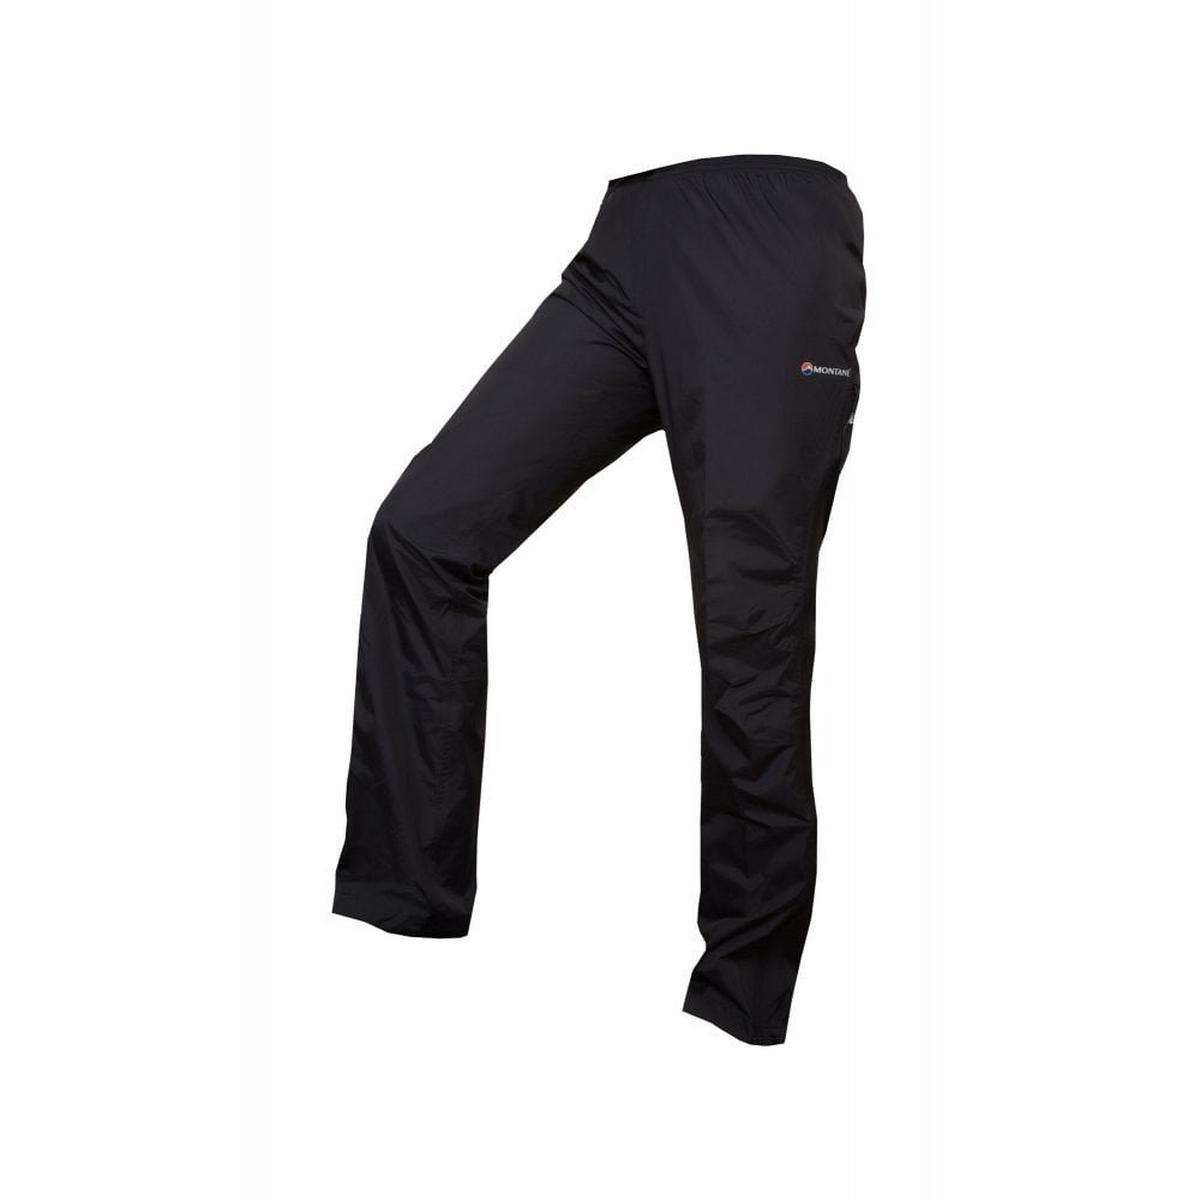 Montane Women's Montane Dynamo Waterproof Pants Reg - Black